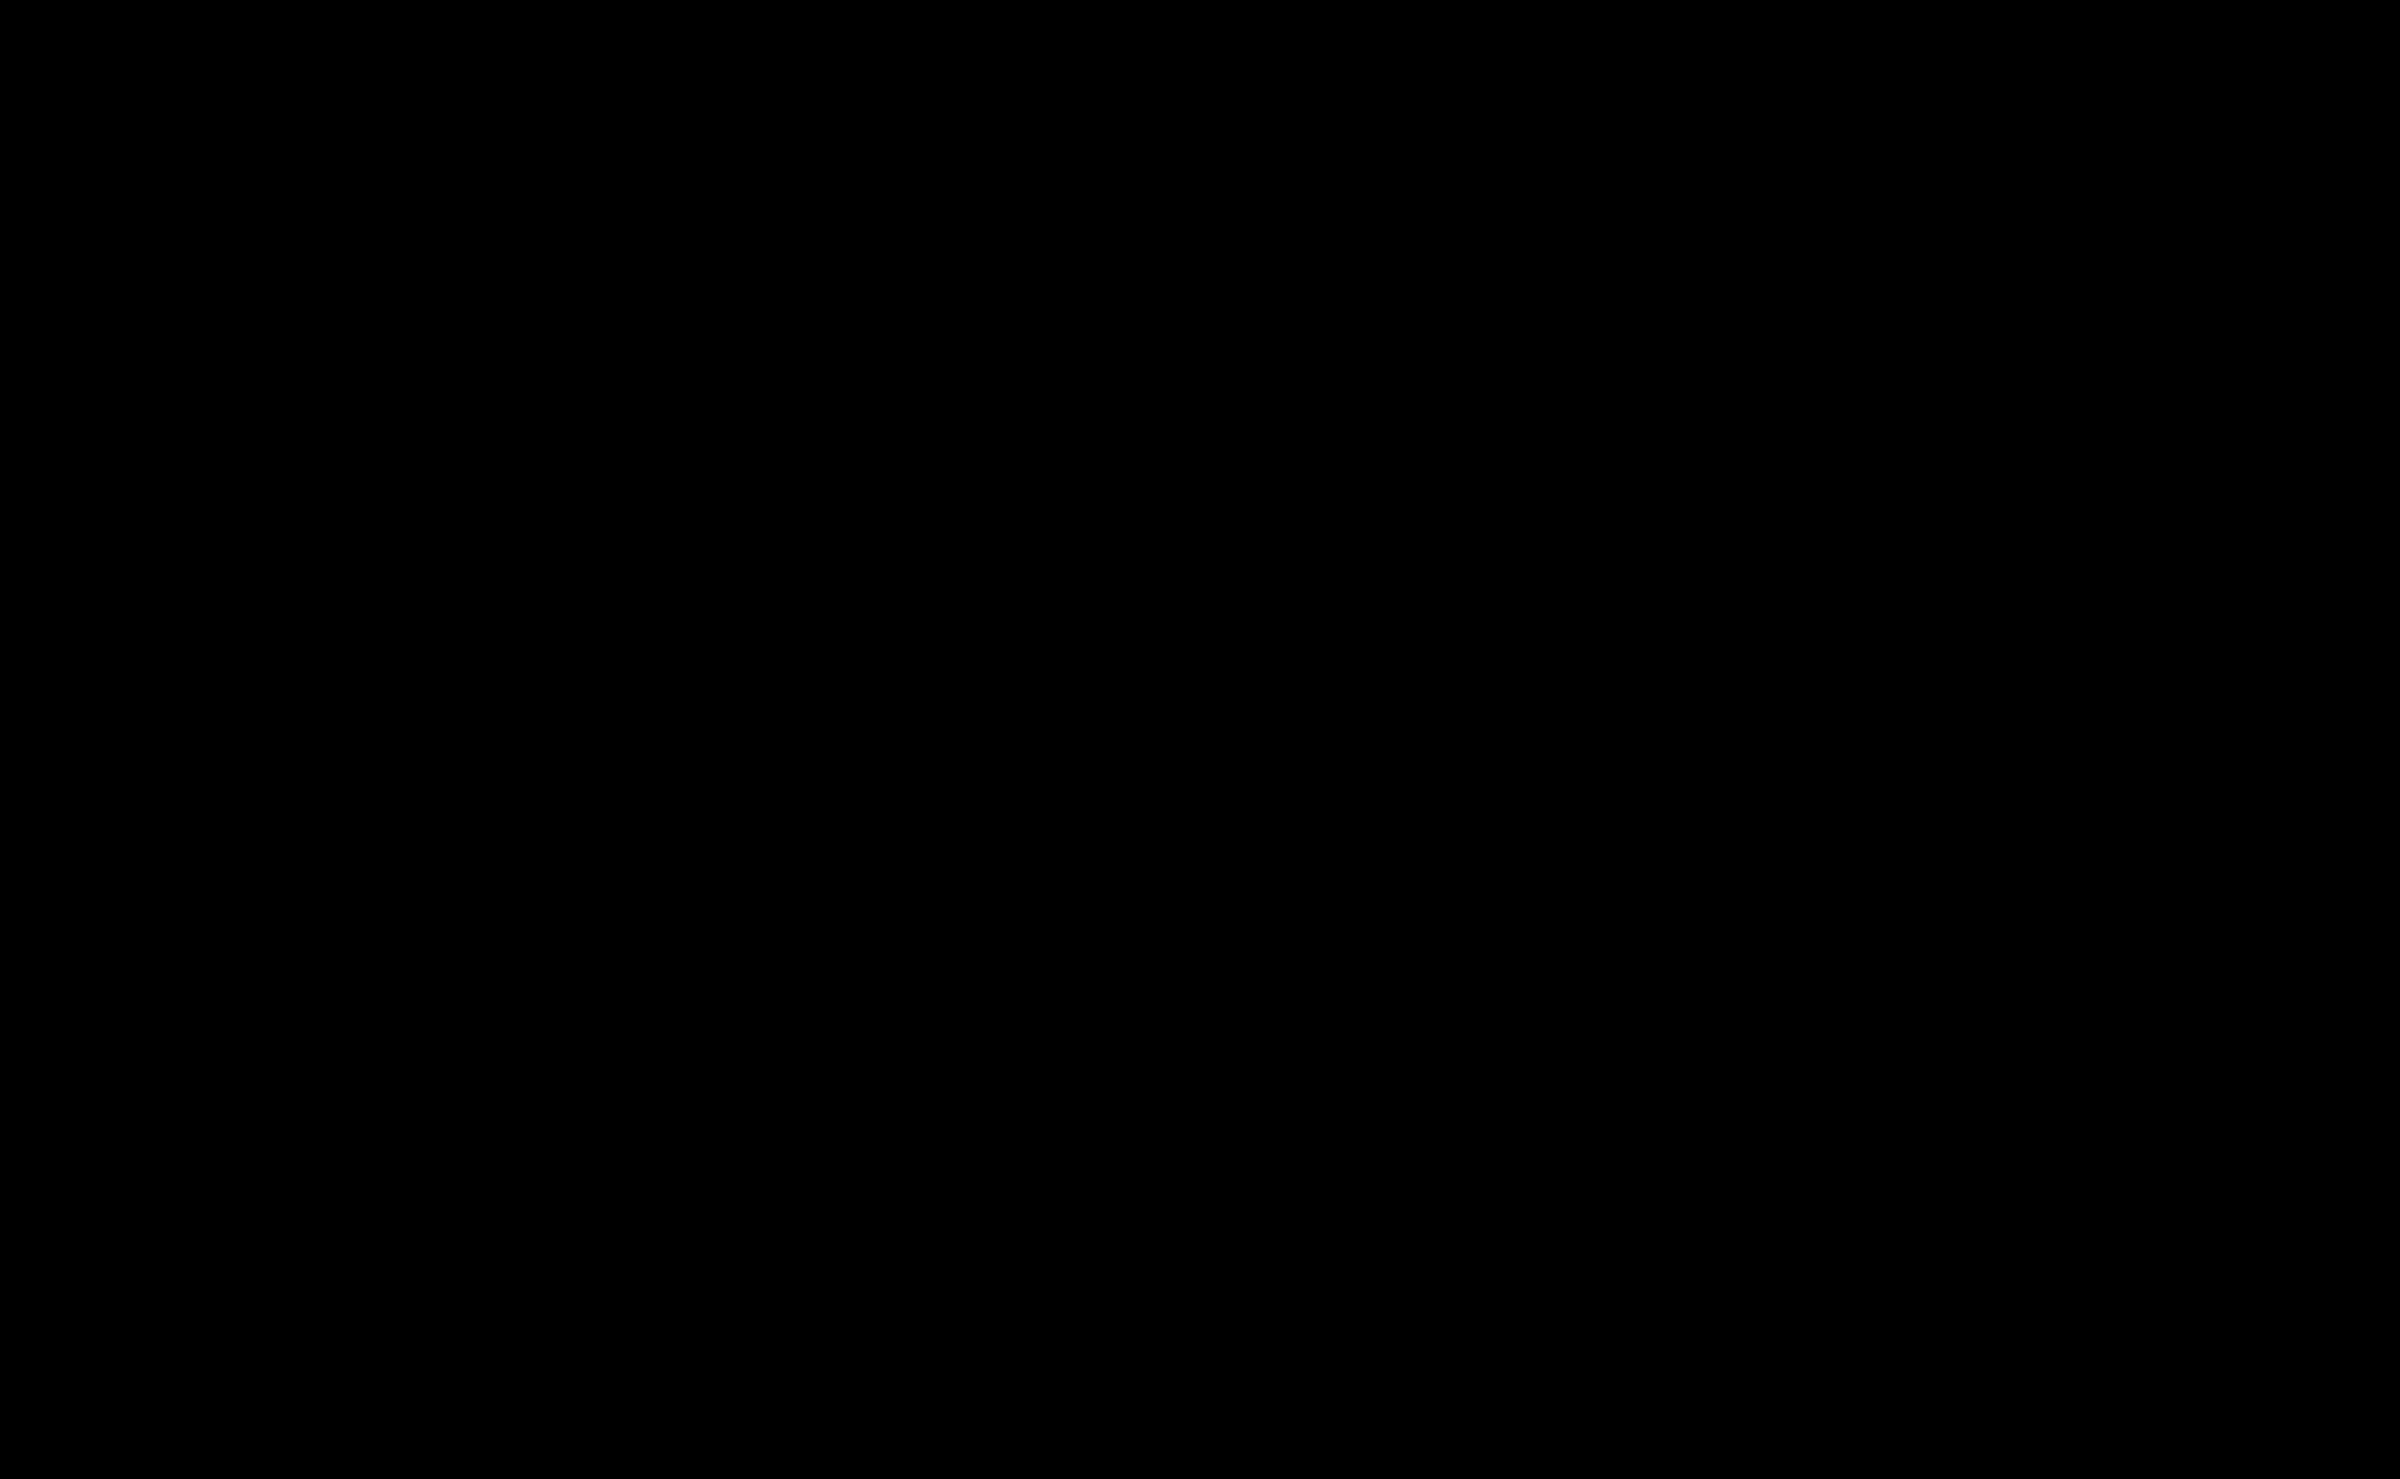 pfizer-logo-black-and-white.png